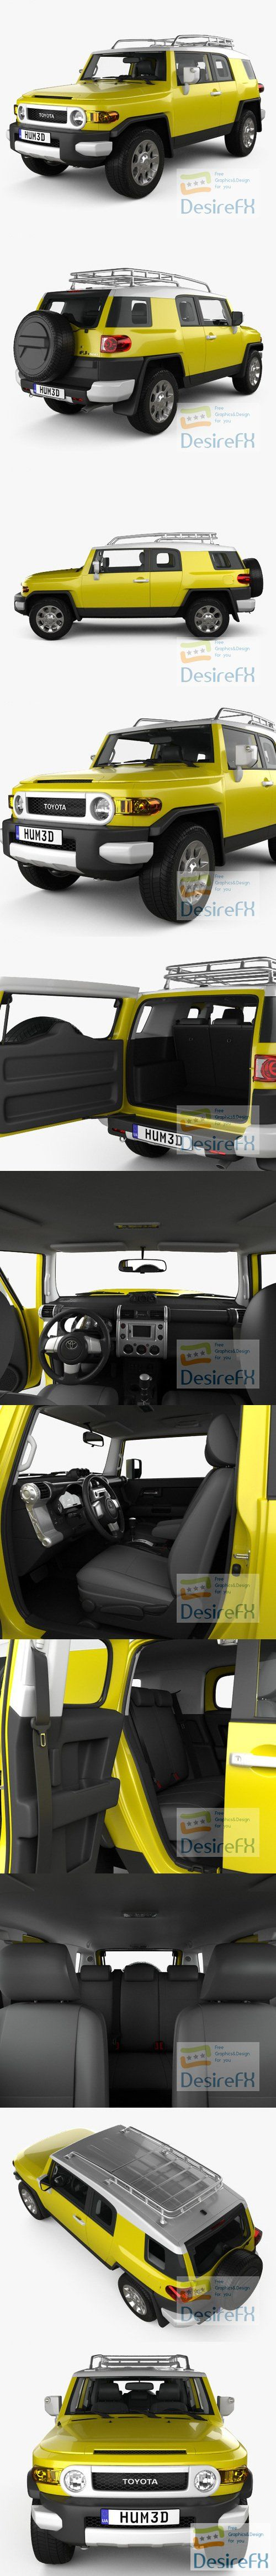 Toyota FJ Cruiser with HQ interior 2010 3D Model